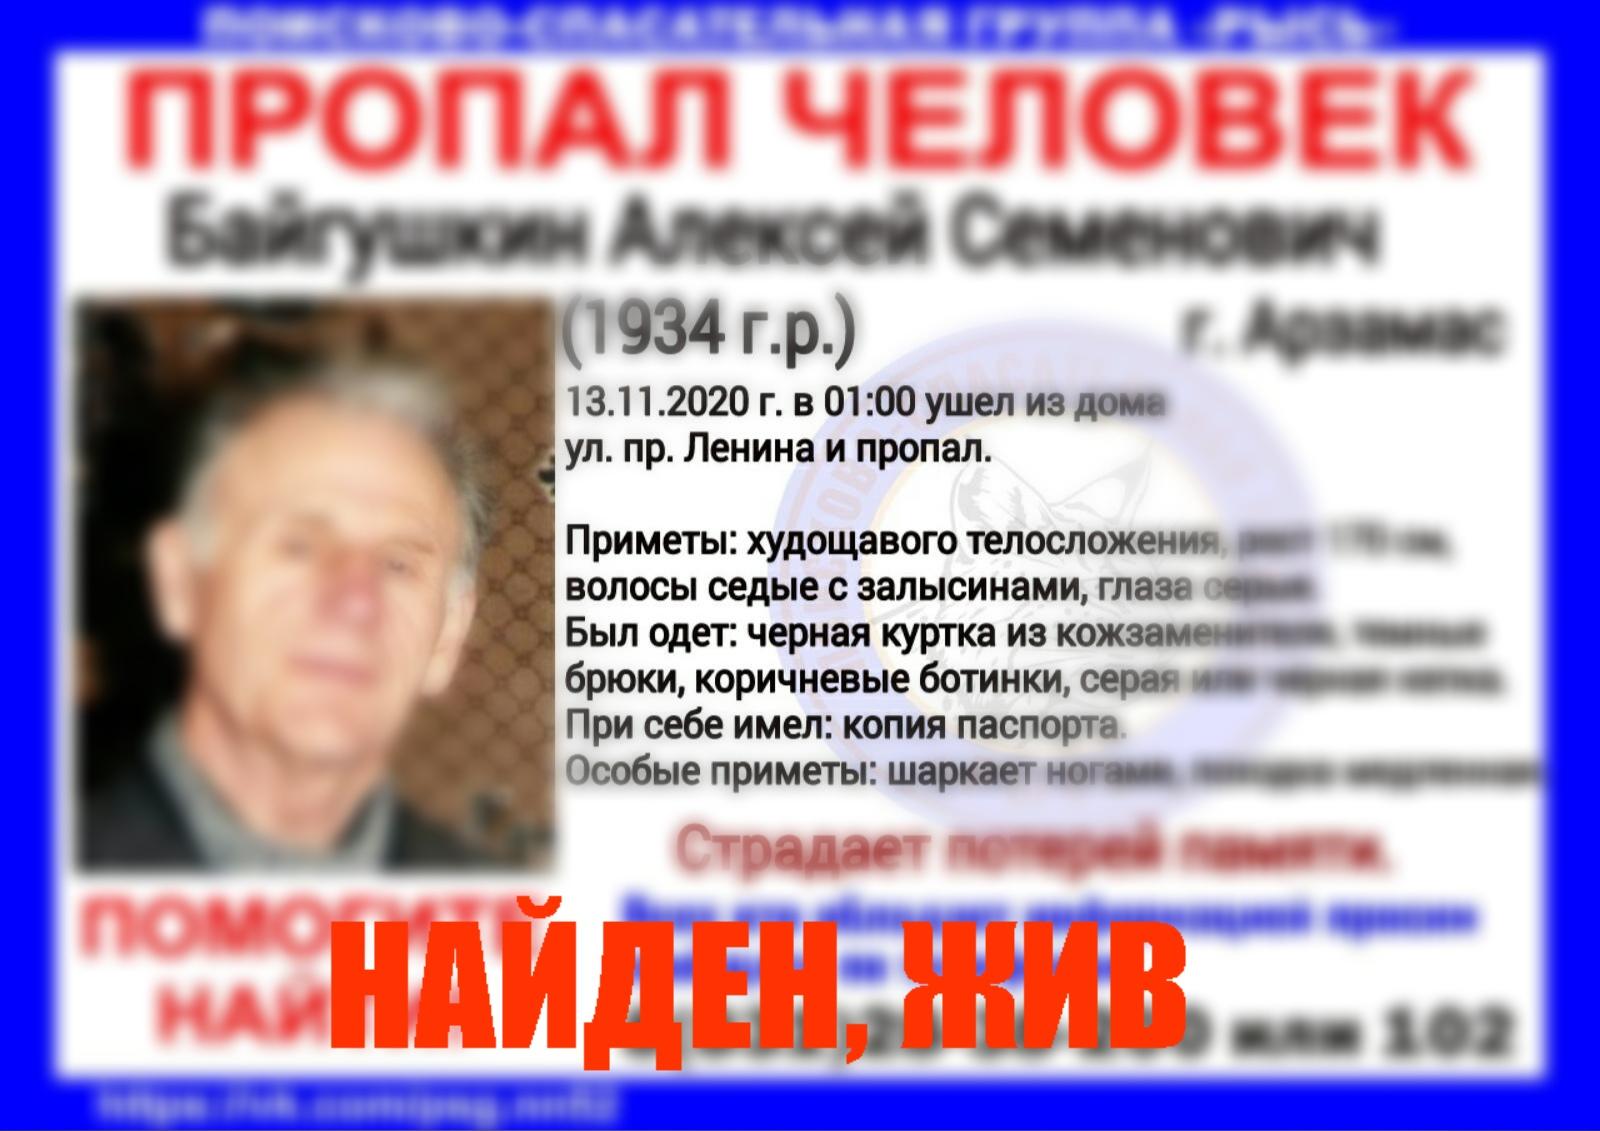 Байгушкин Алексей Семенович